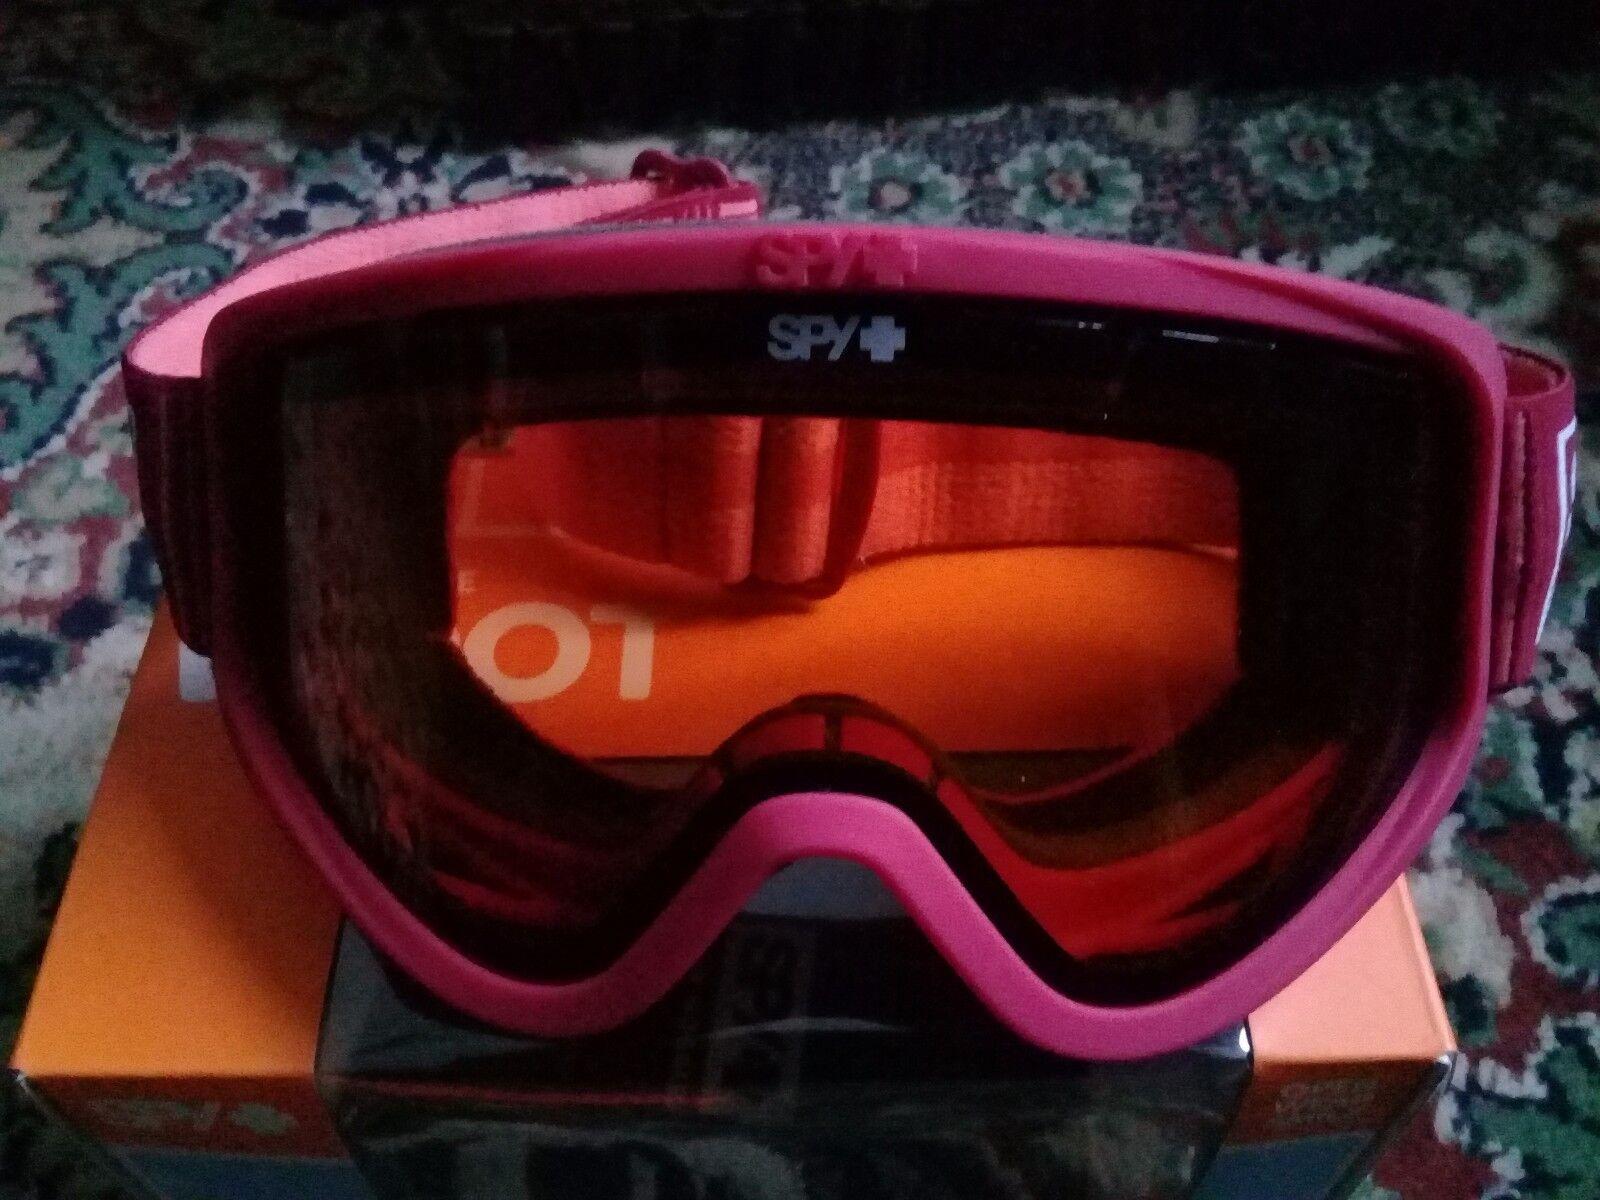 Spy Woot Permission snow board  Ski goggles size 5 deep winter bush